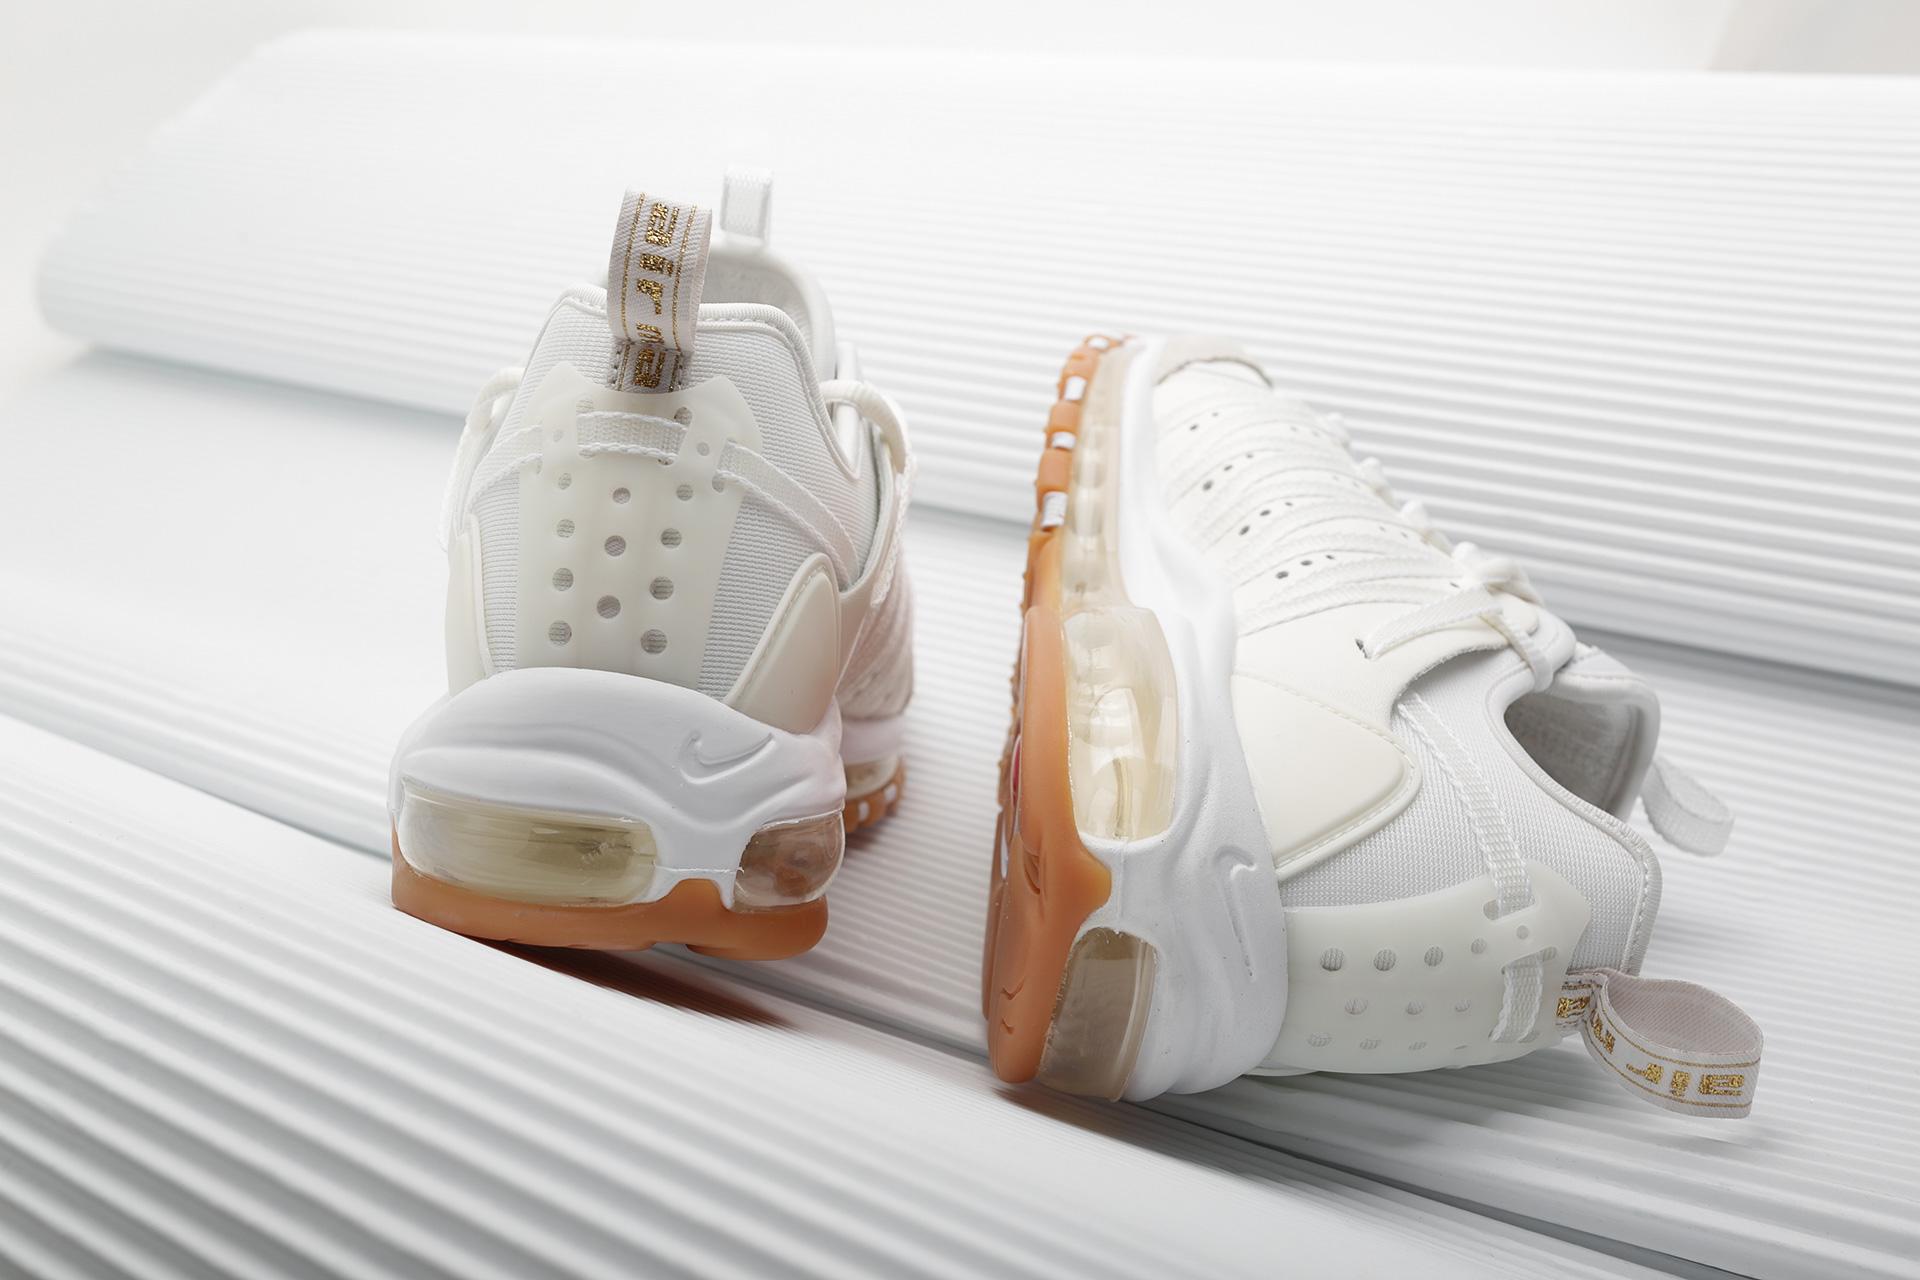 64fcfe71 ... Купить мужские белые кроссовки Nike Air Max 97 / Haven / Clot - фото 3  картинки ...